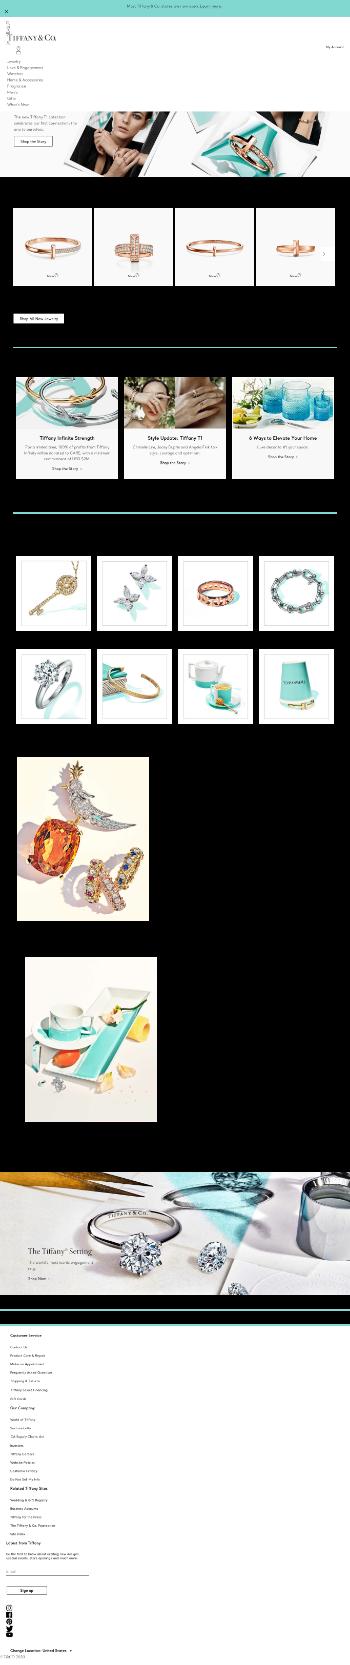 Tiffany & Co. Website Screenshot